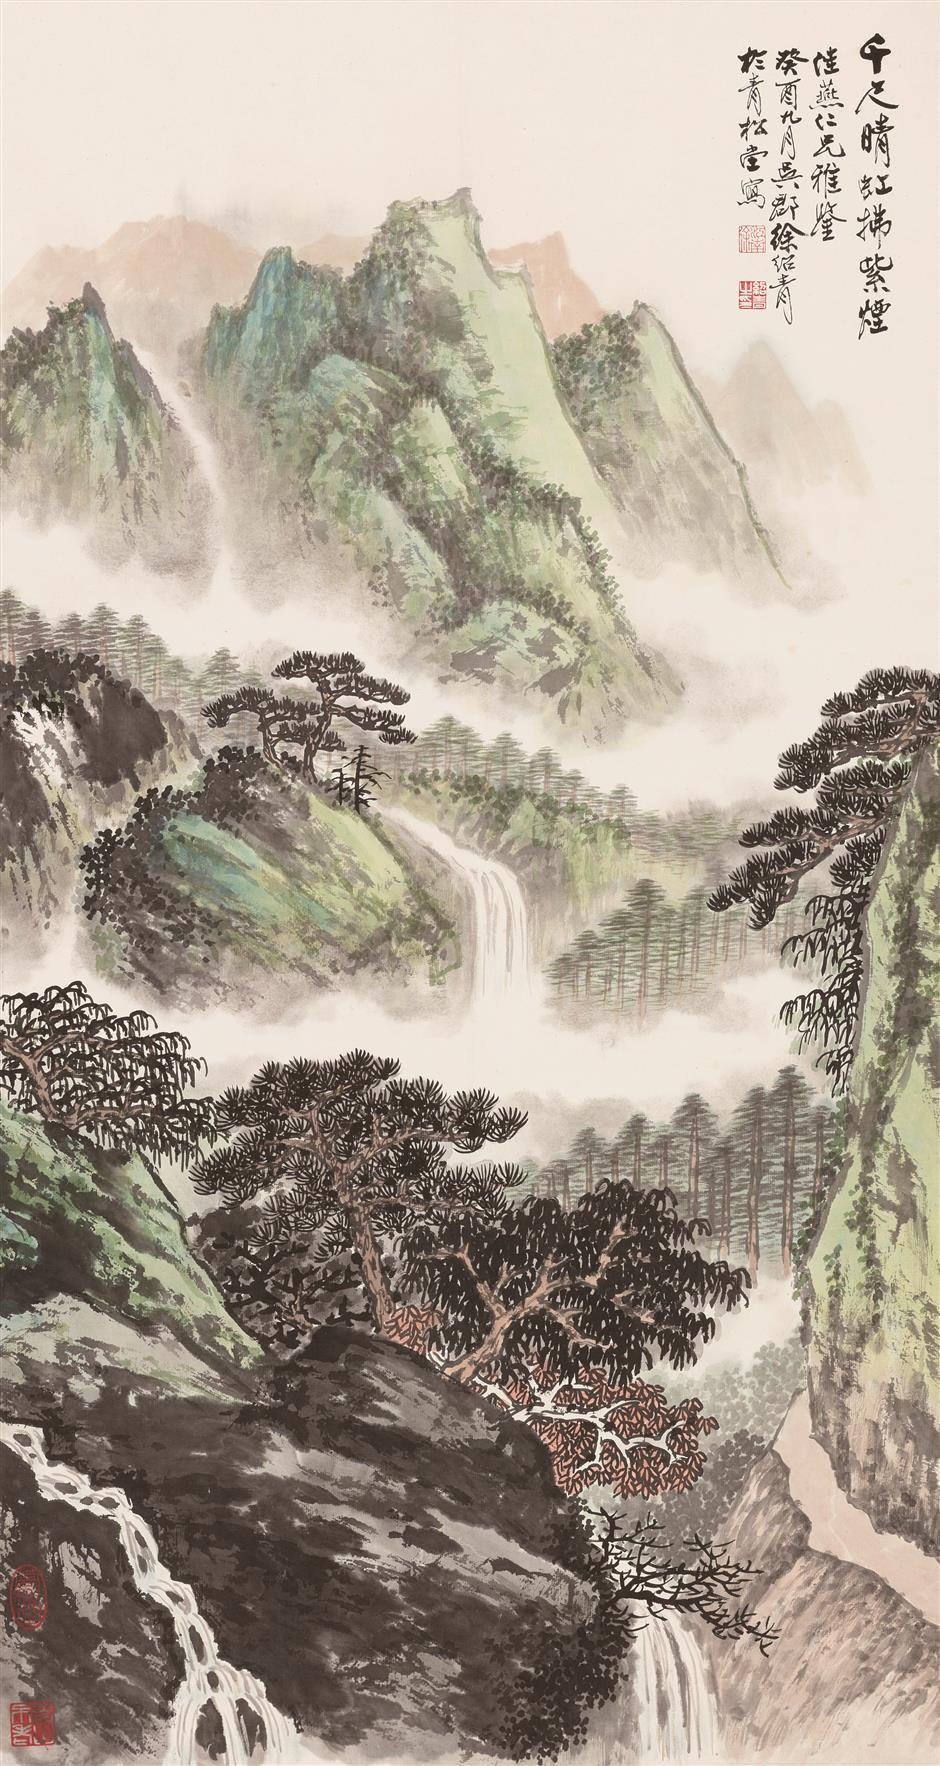 Award-winning Wu School's art essence on display